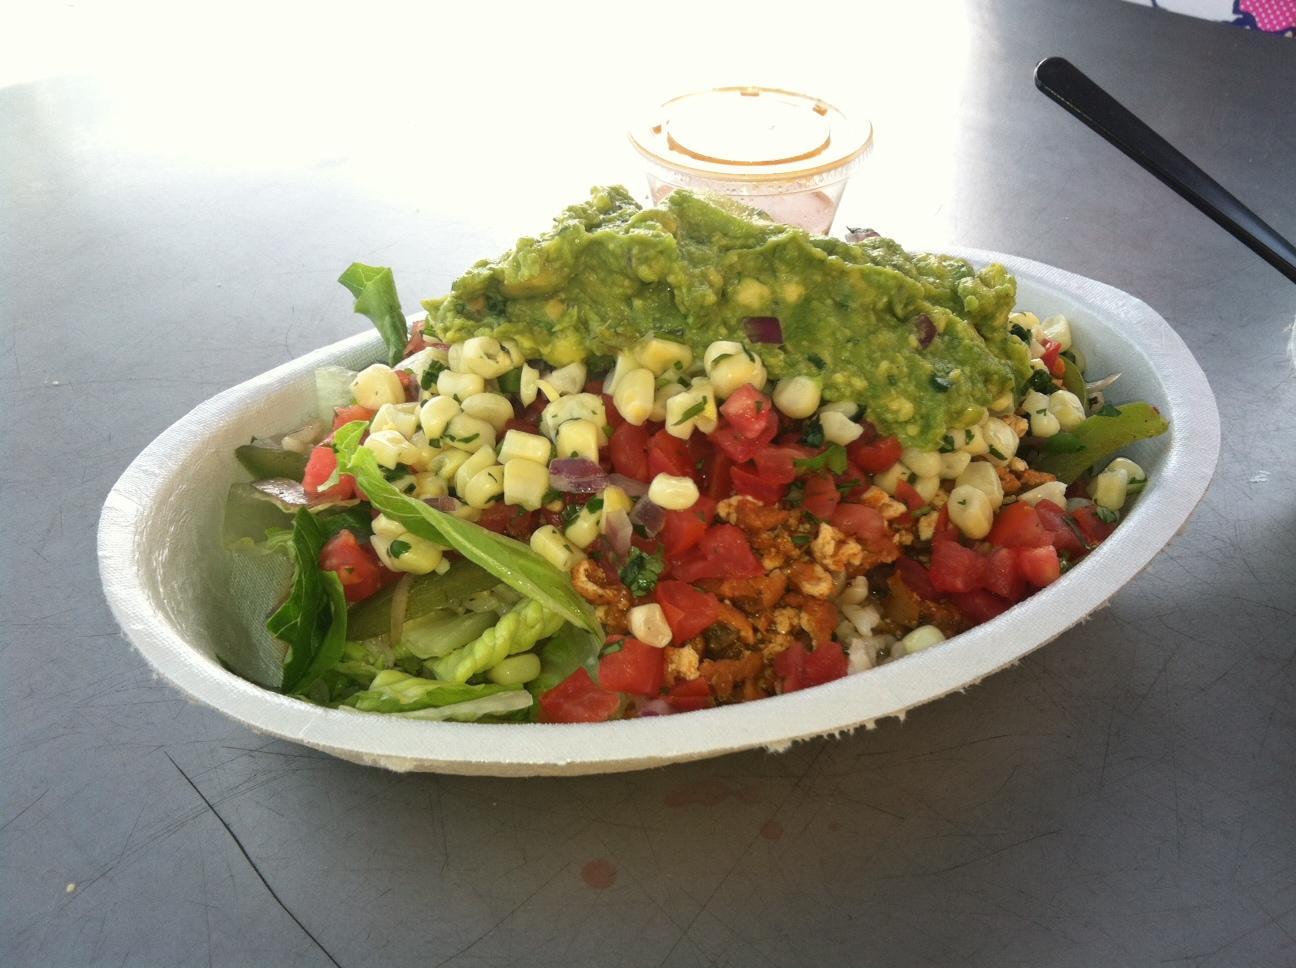 Very organized salad